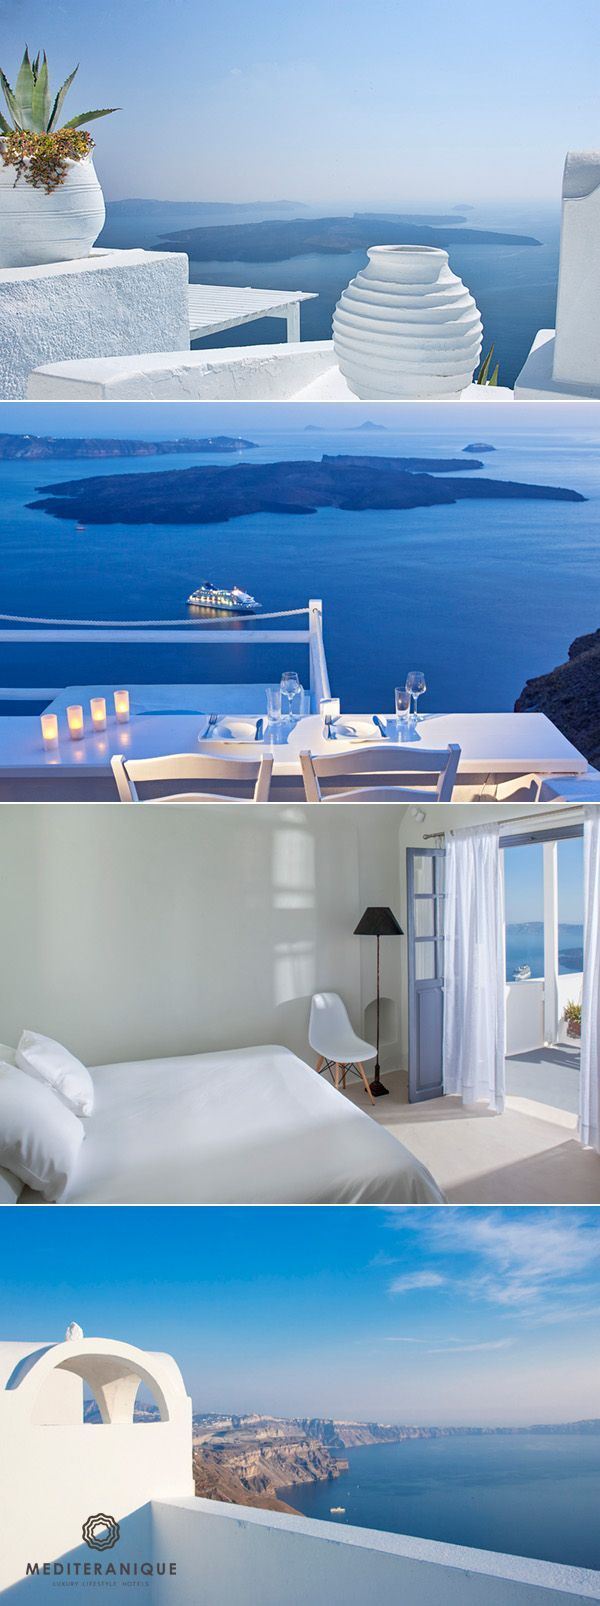 Mykonos tours amp travel bill amp coo hotel in mykonos greece - 5 Incredible Luxury Boutique Hotels In Greece